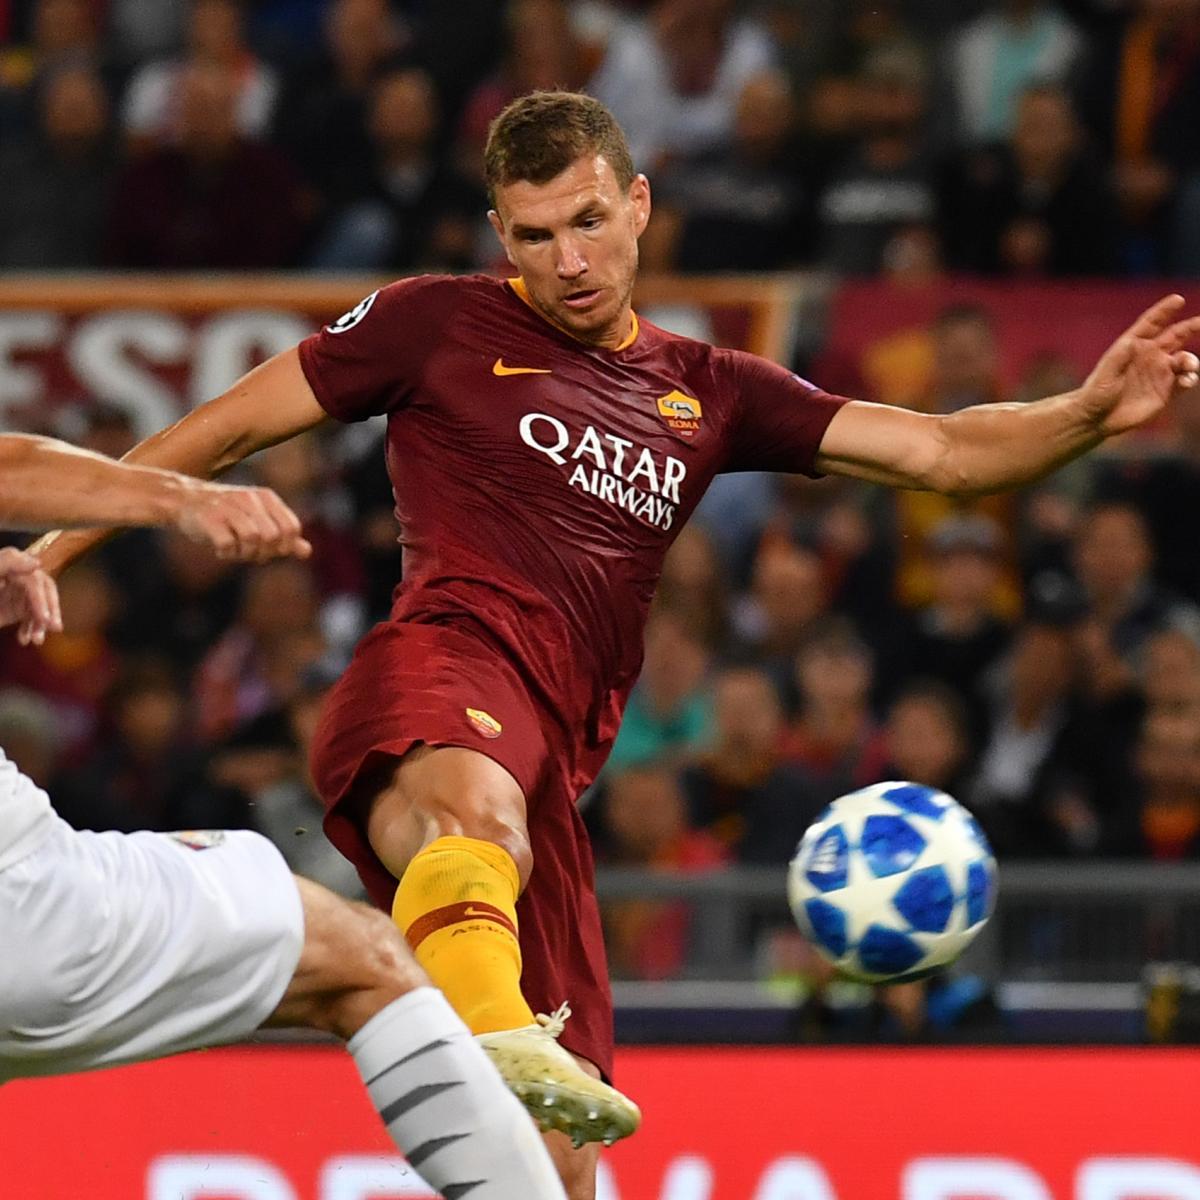 Champions League 2019 Round Of 16 Leg 2 Live Stream Tv: AS Roma Vs. FC Porto: How To Watch, Live Stream Info